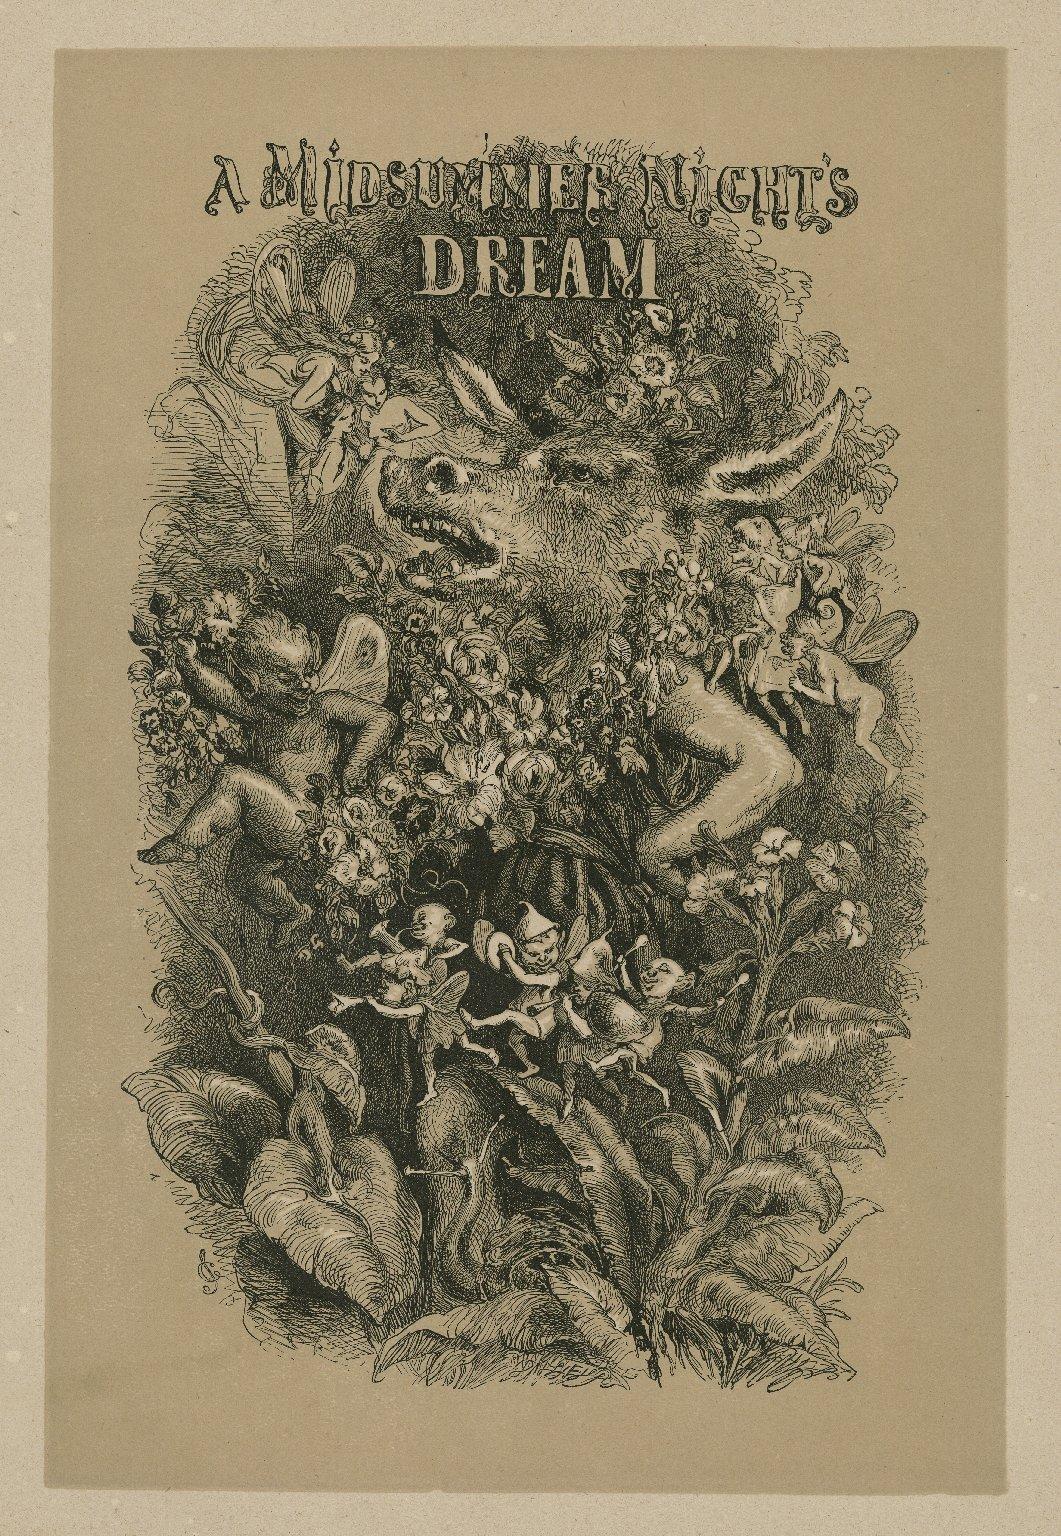 A midsummer night's dream [act III, scene 1] [graphic] / JG ; Dalziel, Sc.